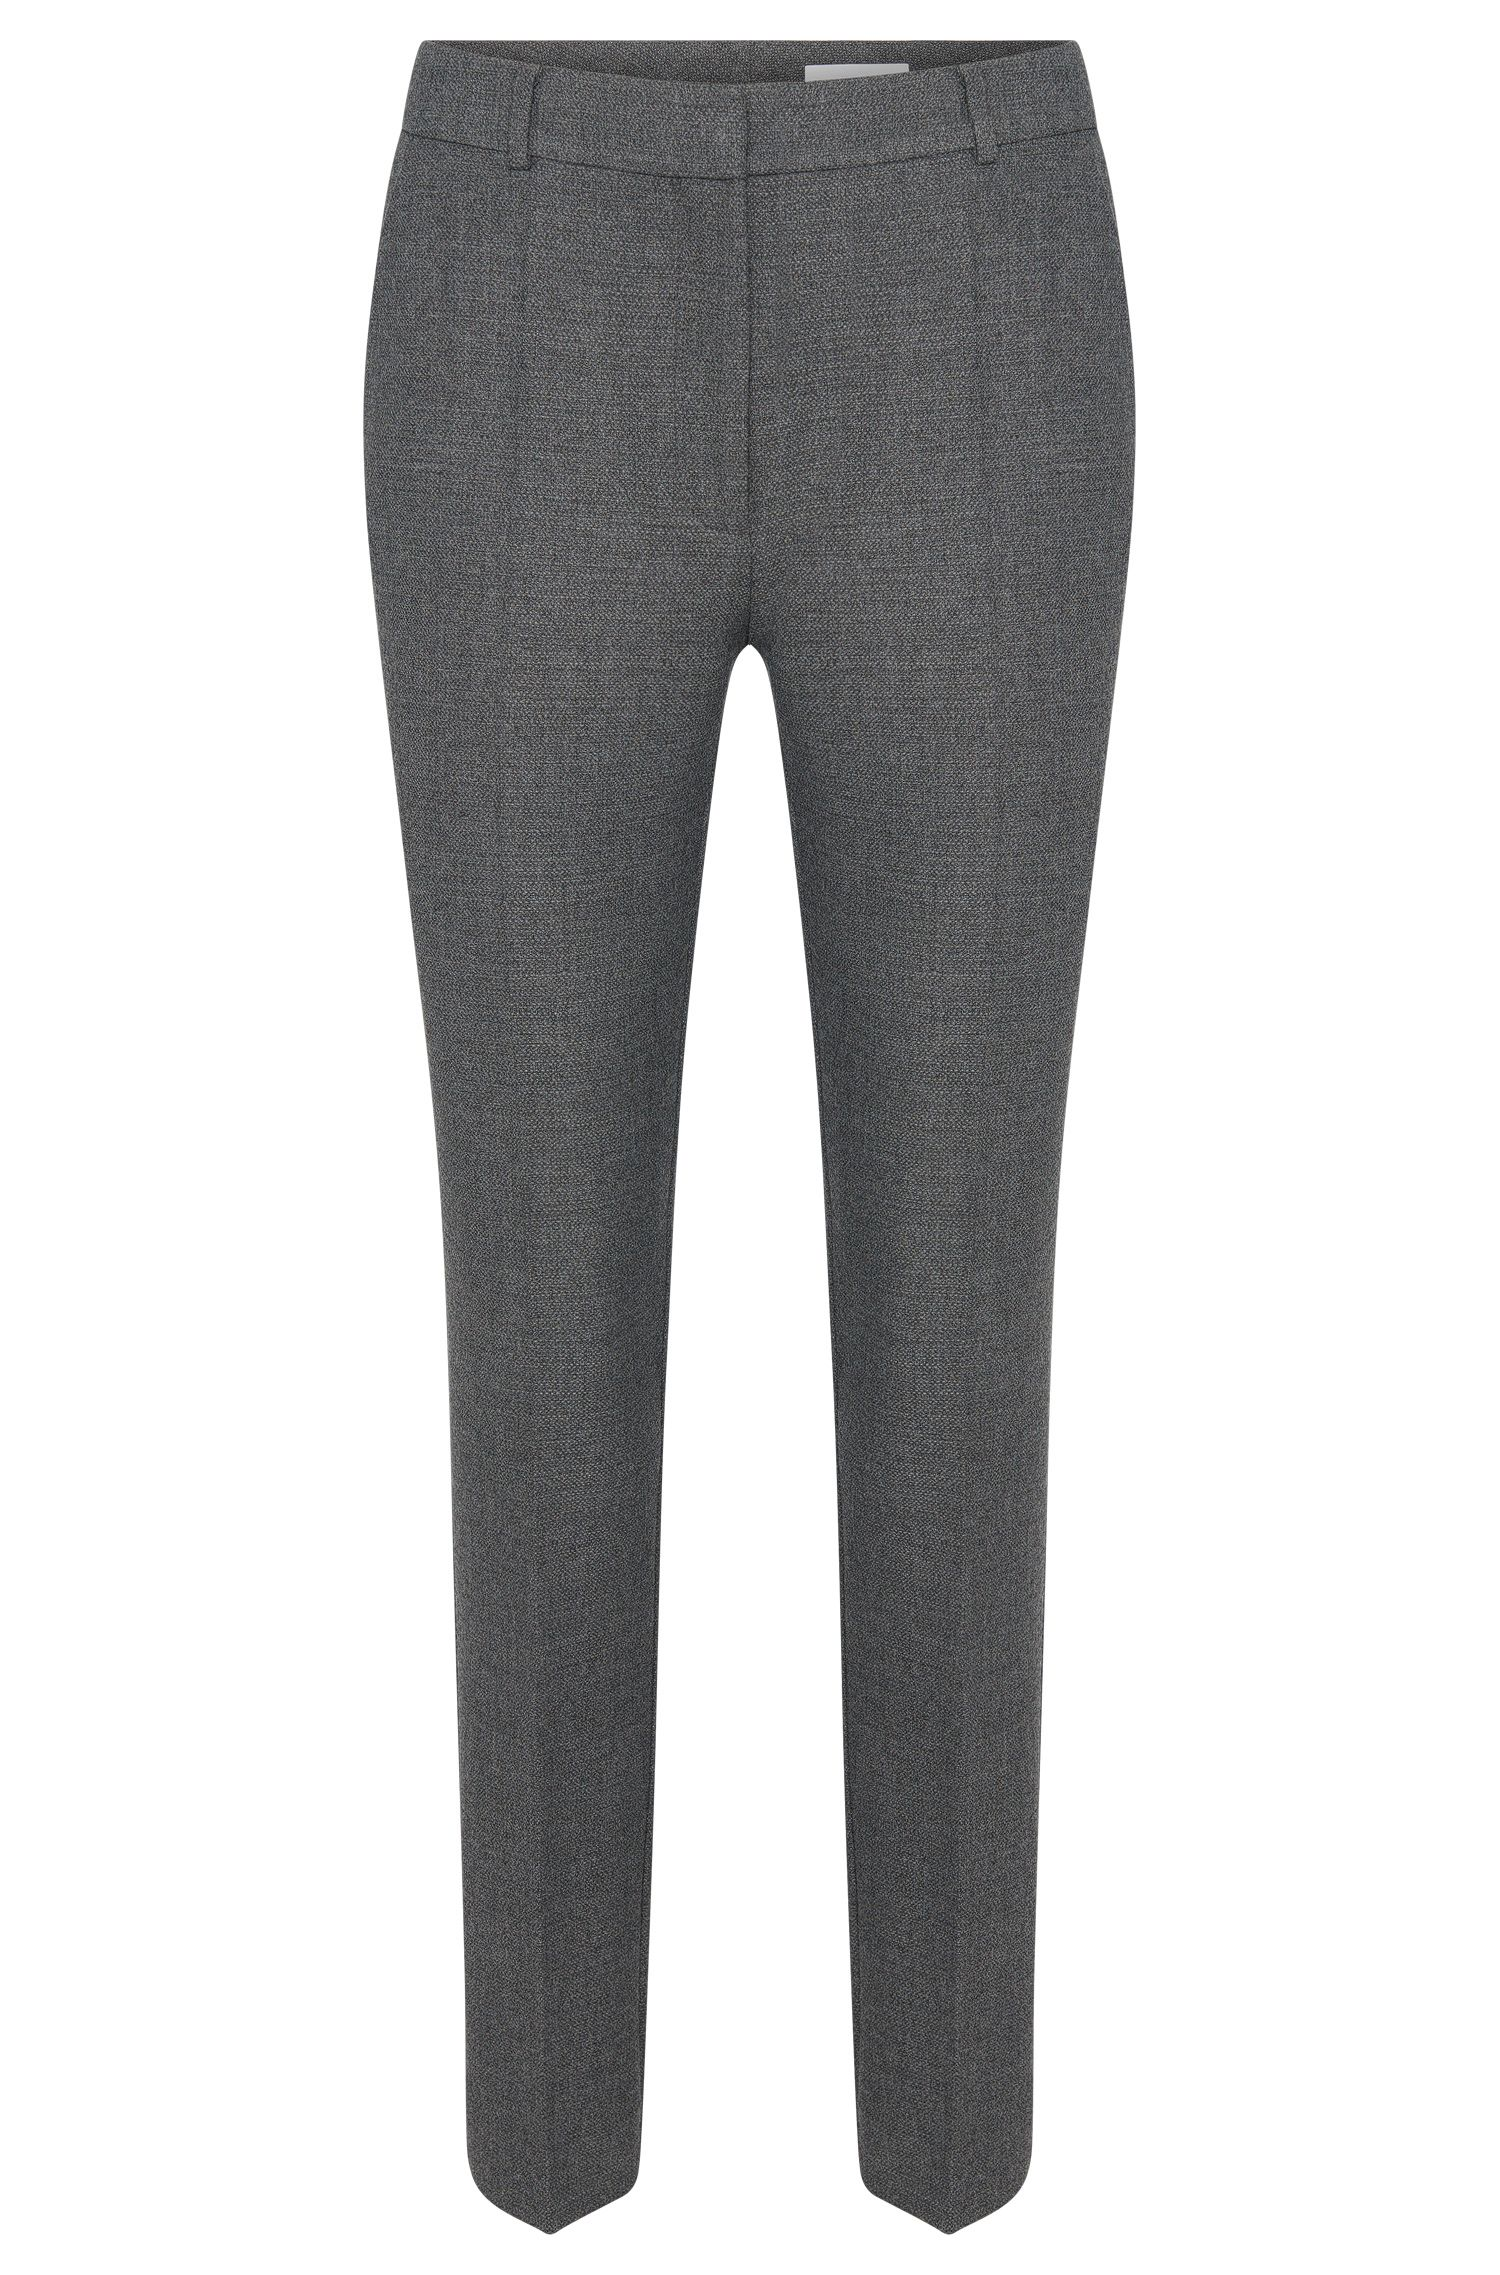 'Acnes' | Stretch Virgin Wool Blend Melange Trousers